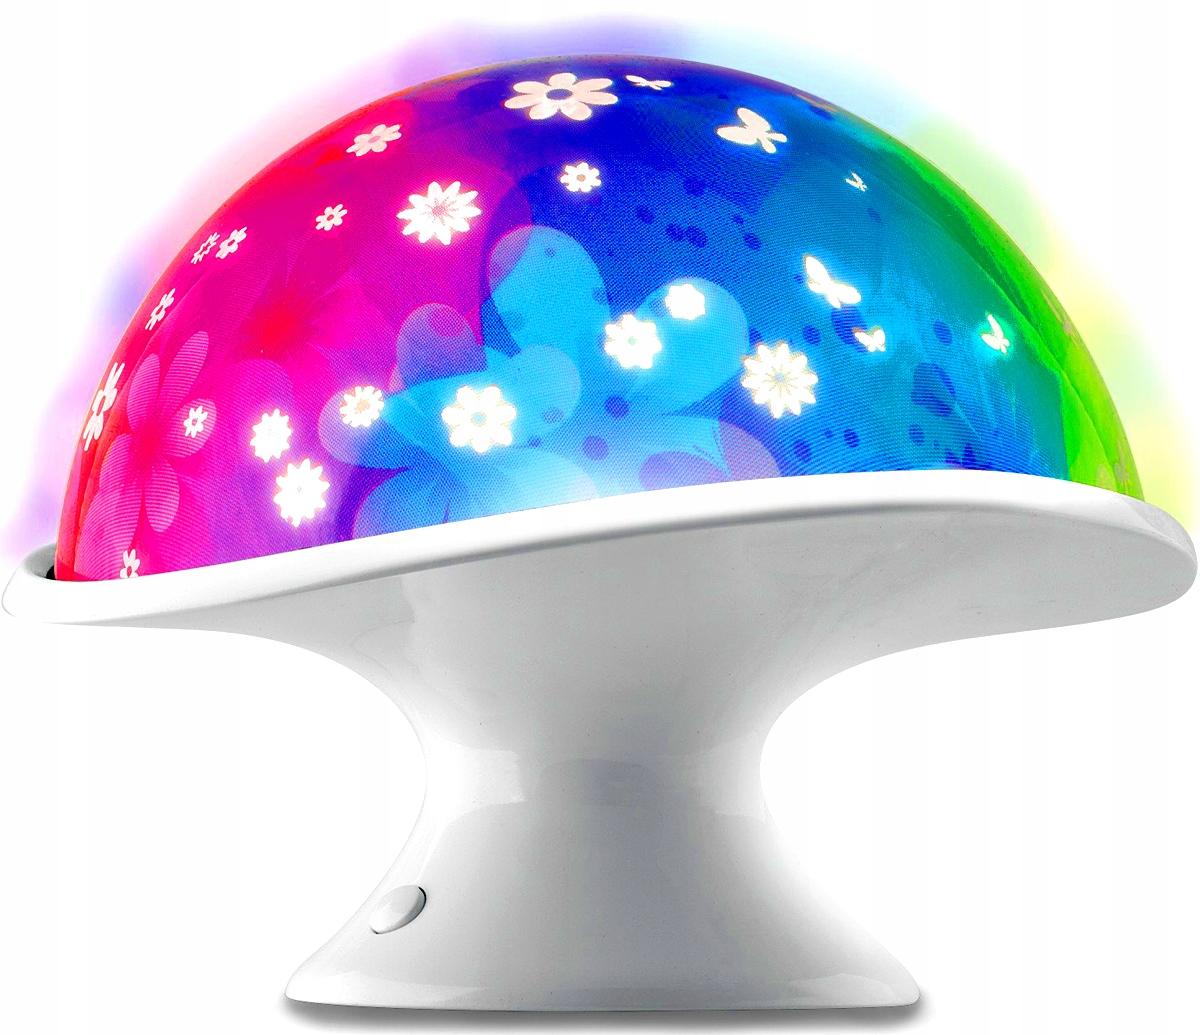 DUMEL LAMPKA NOCNA LED - KOLOROWY PROJEKTOR